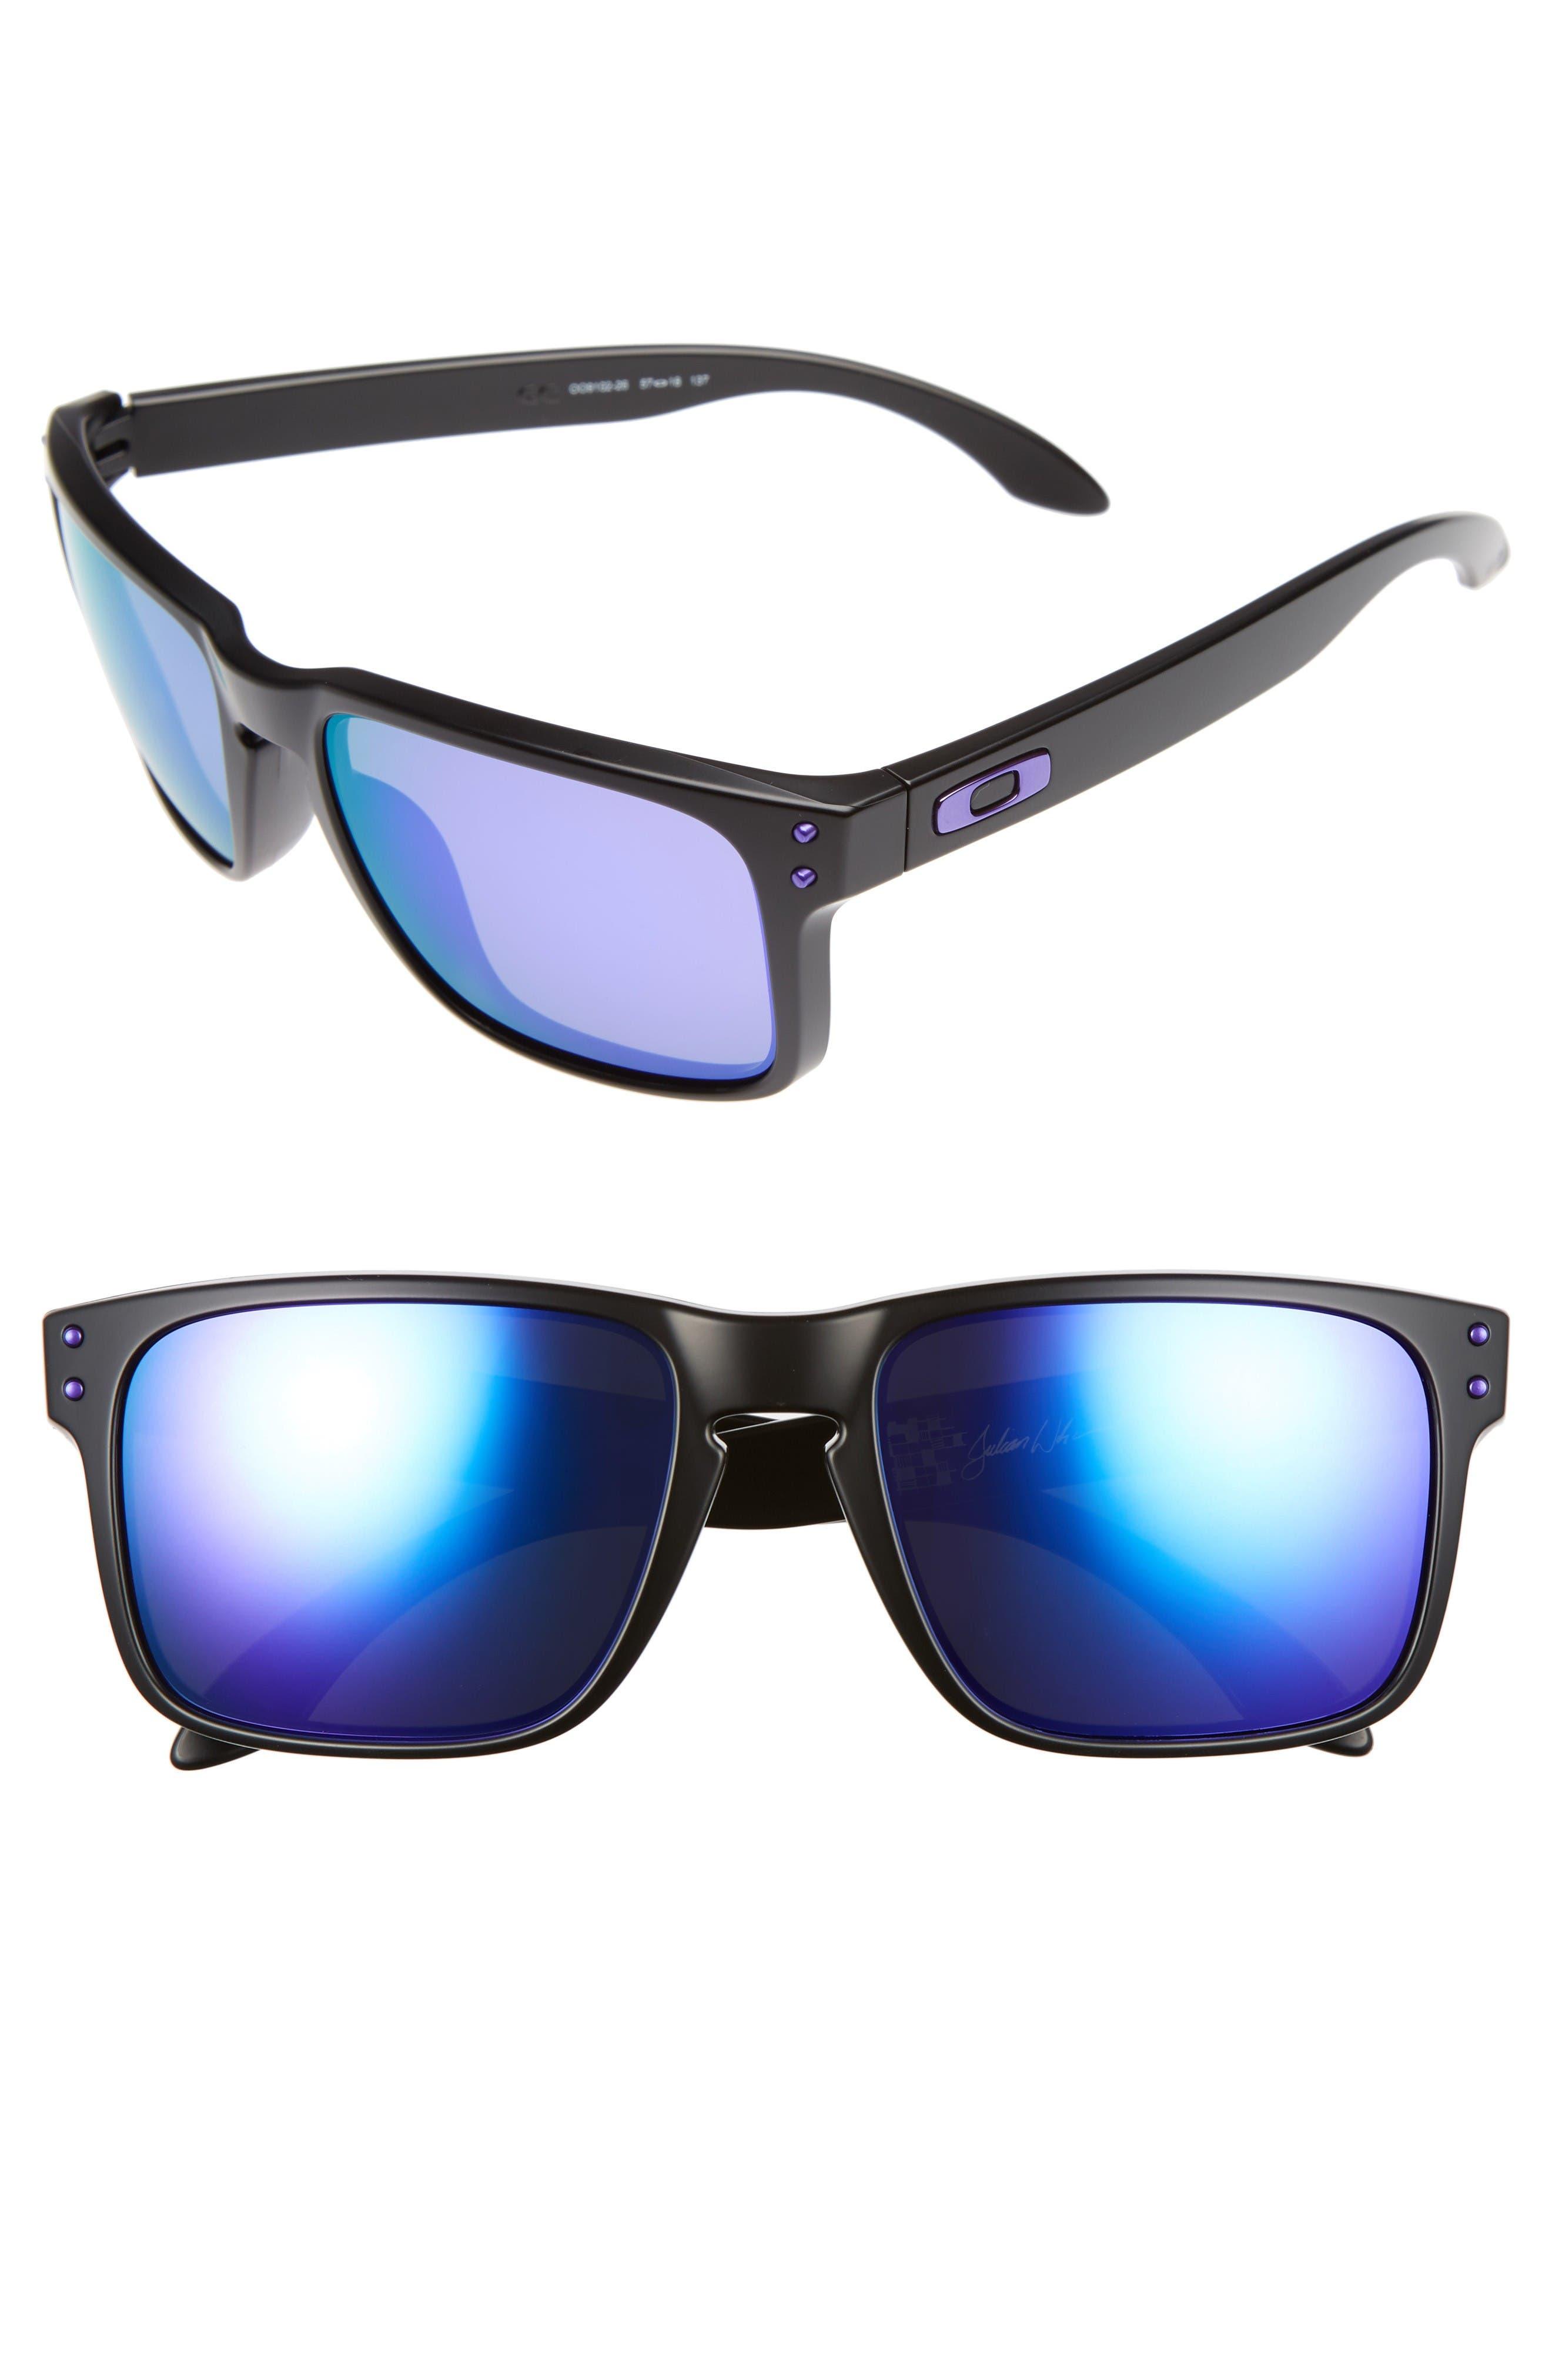 Main Image - Oakley Julian Wilson Signature Series Holbrook 57mm Sunglasses